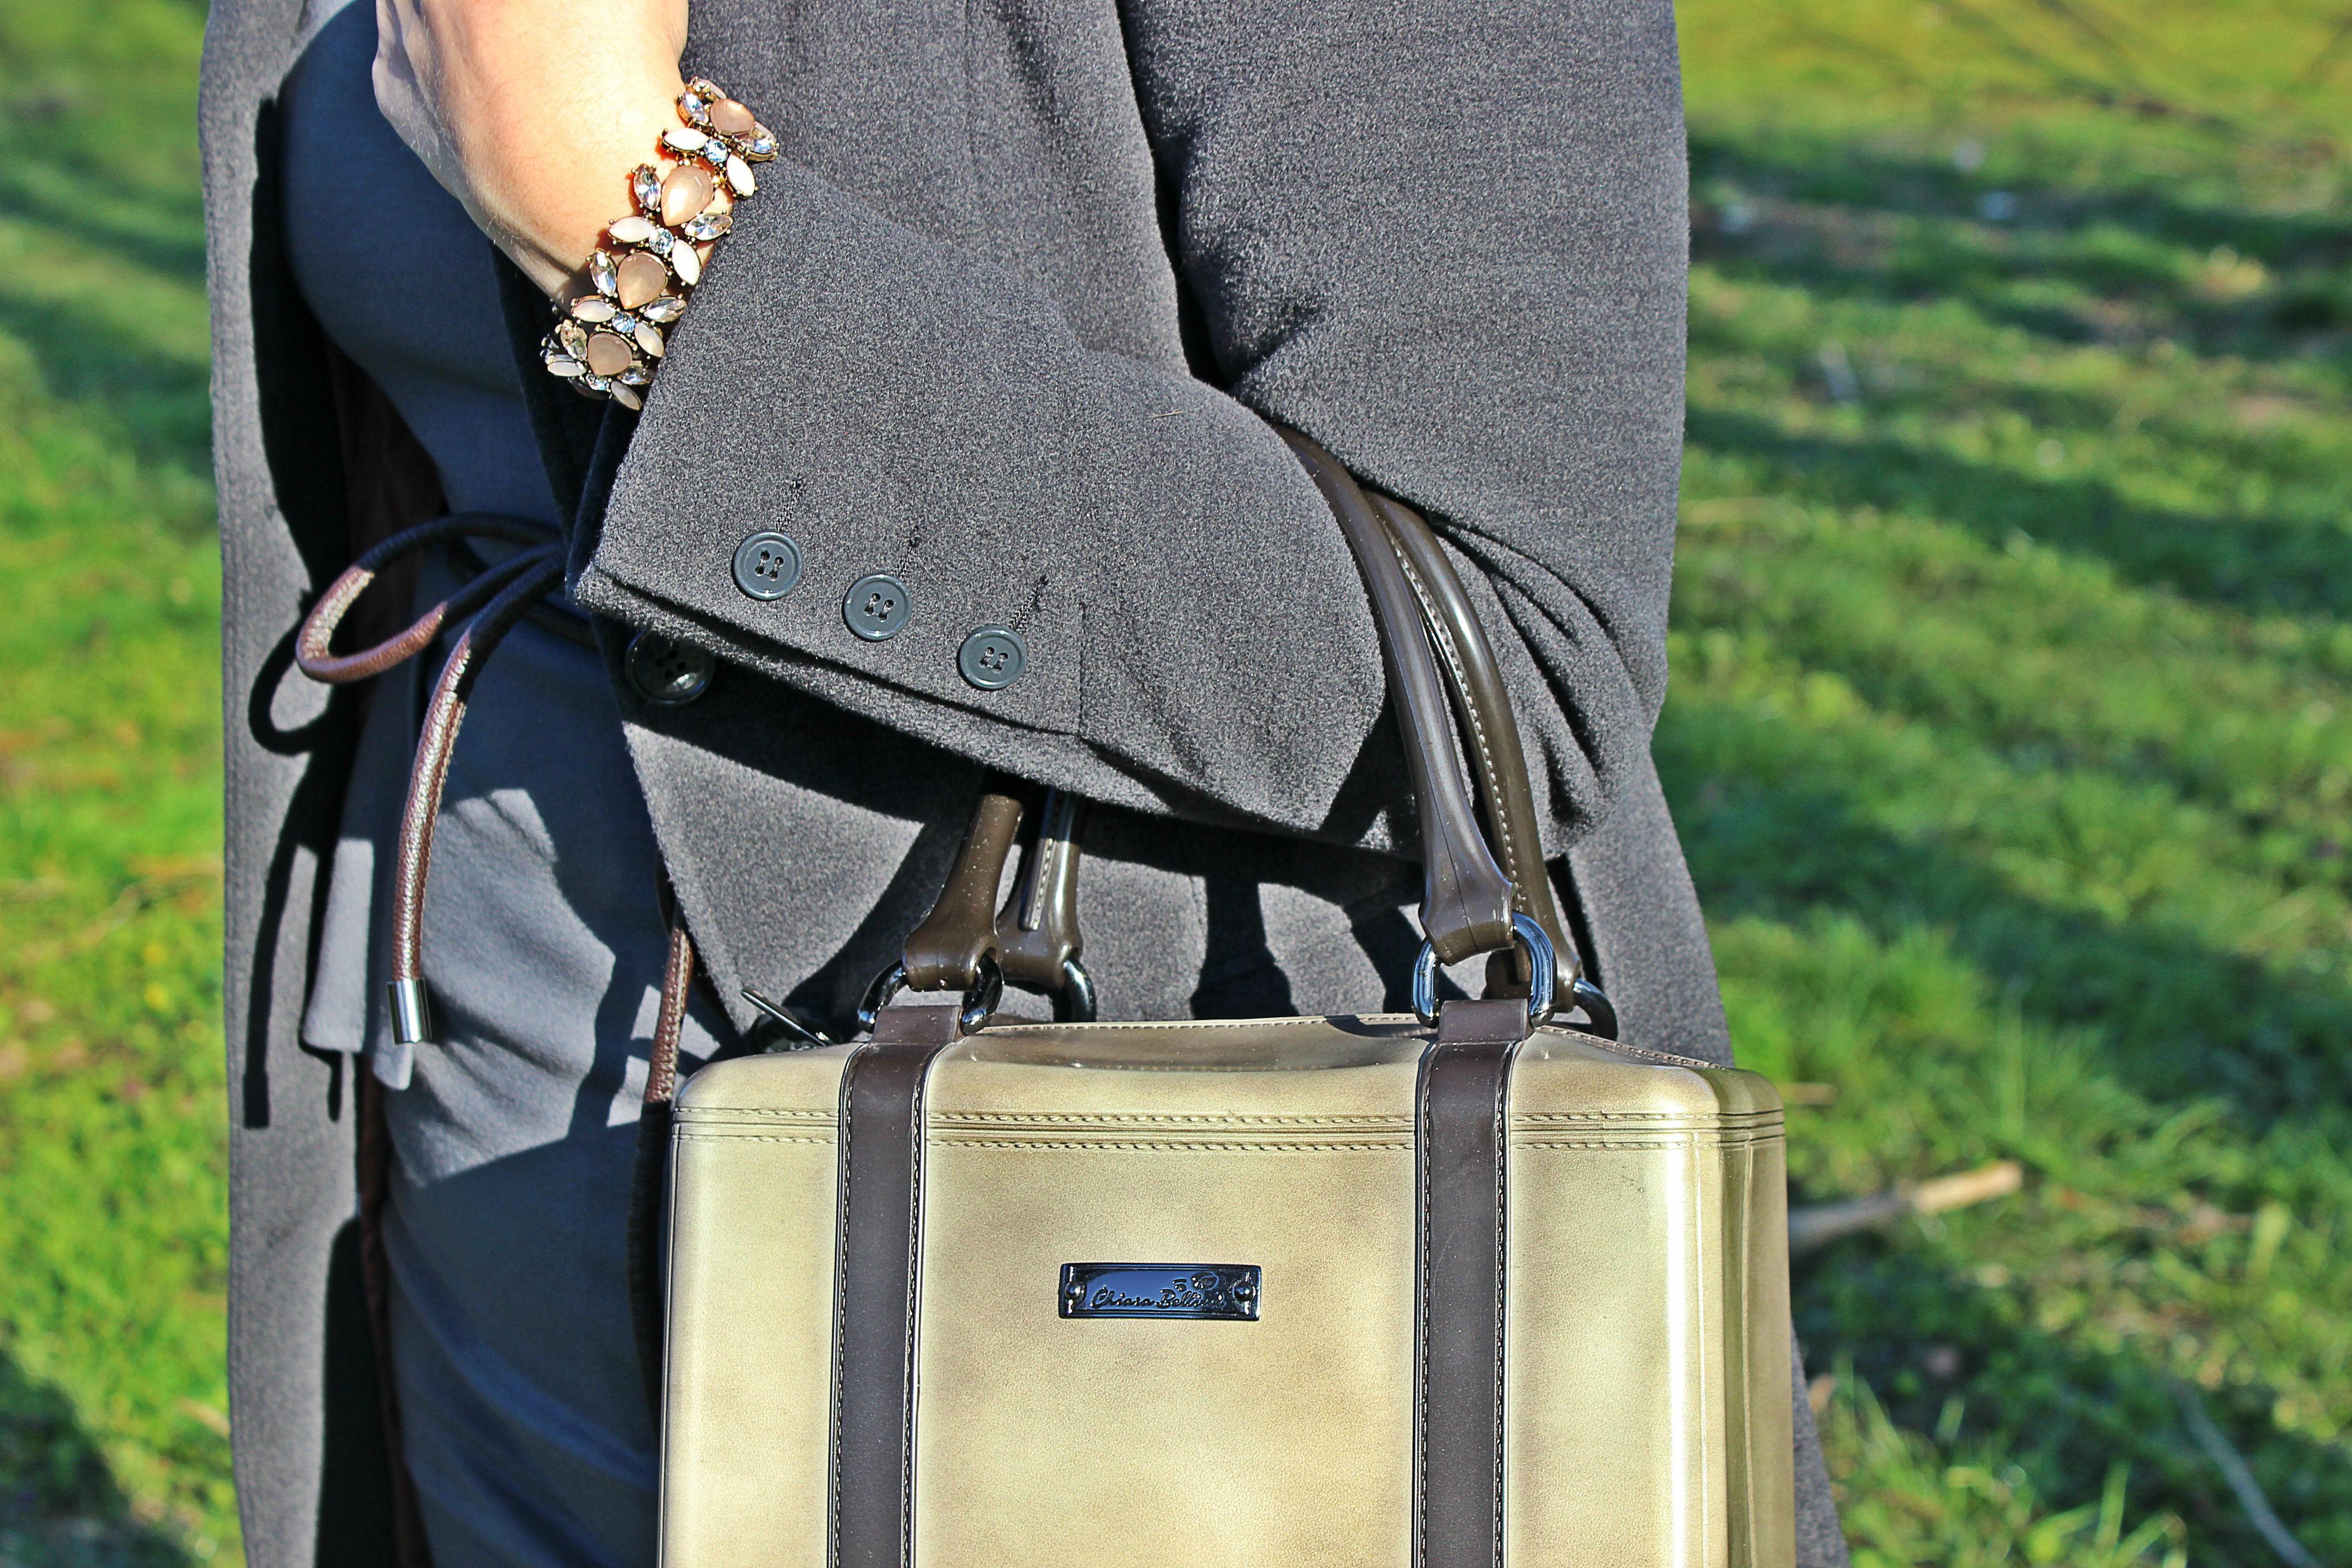 CHIARA-BELLINI-boots-bag-pvc-elisabettabertolini-daylook-outfit-madeinitaly9